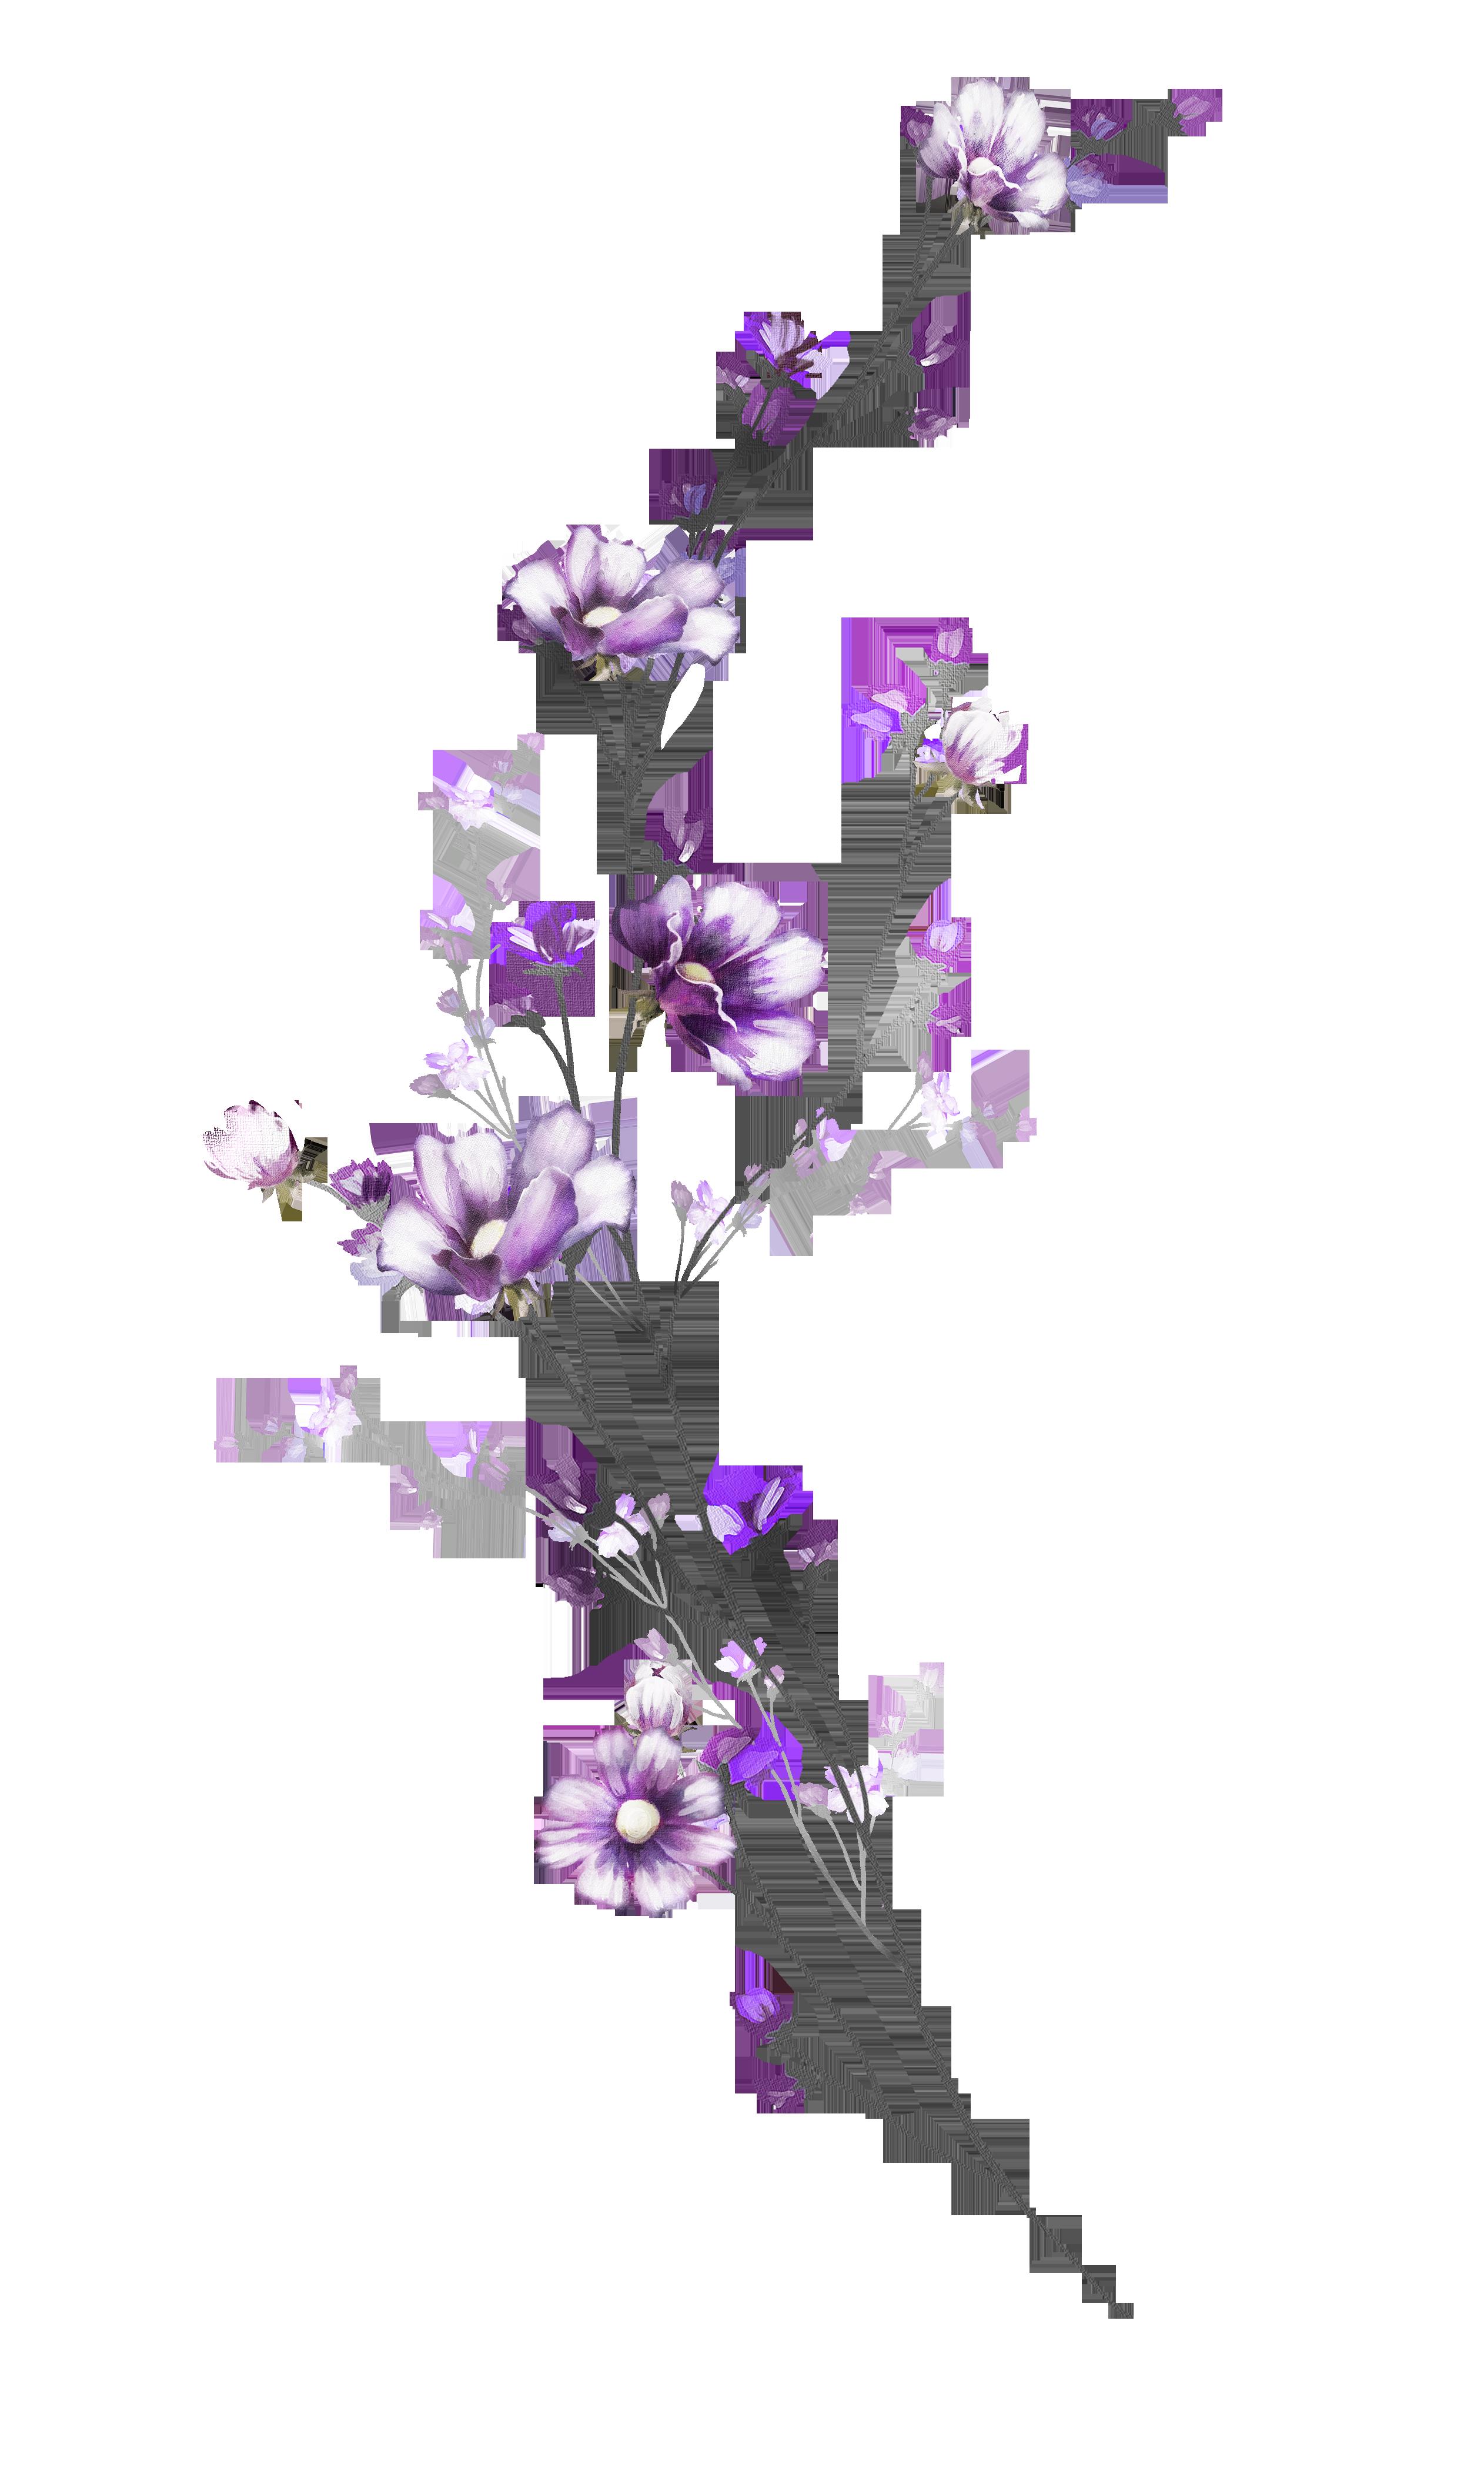 H927 (99) | flowers in 2019 | Flower tattoos, Tattoo ...